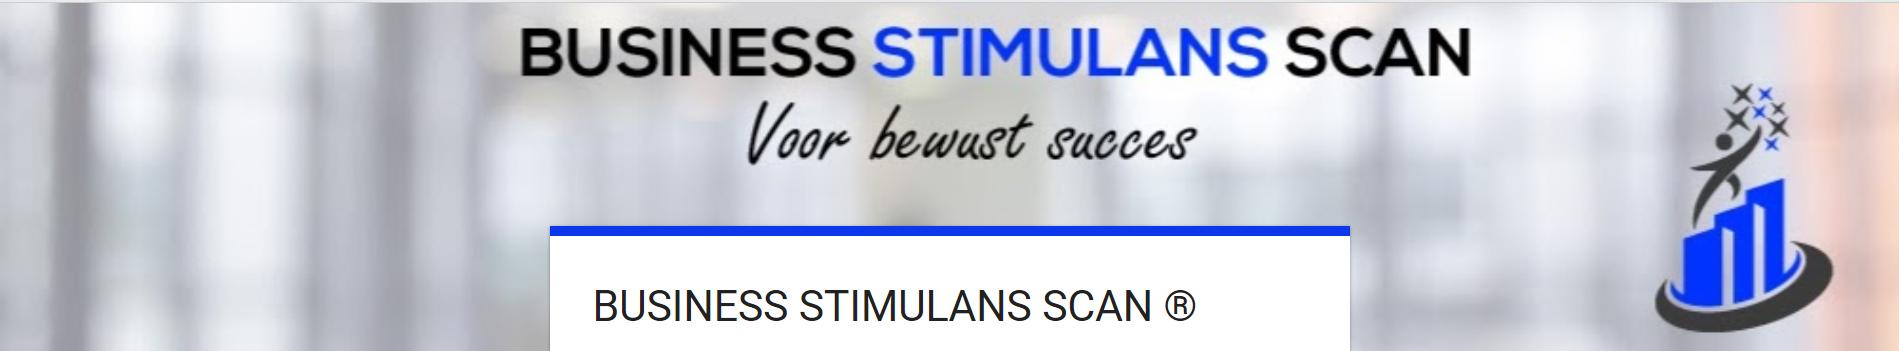 Business Stimulans bedrijfsanalyse - Gratis